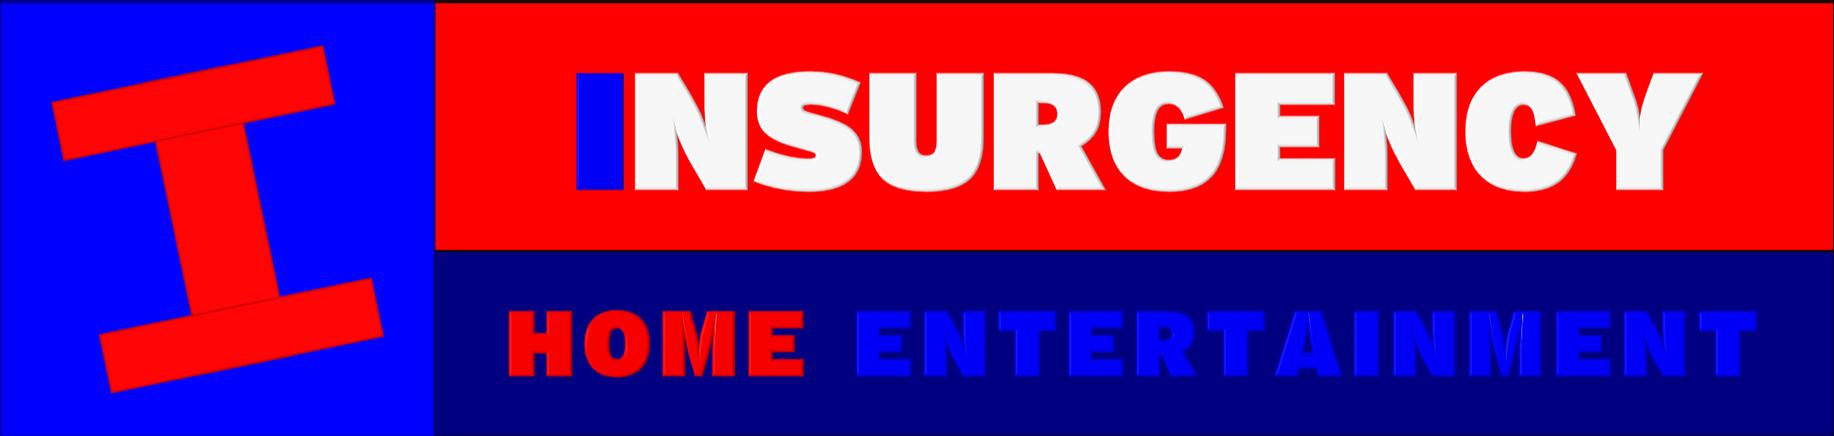 Insurgency Home Entertainment Logo